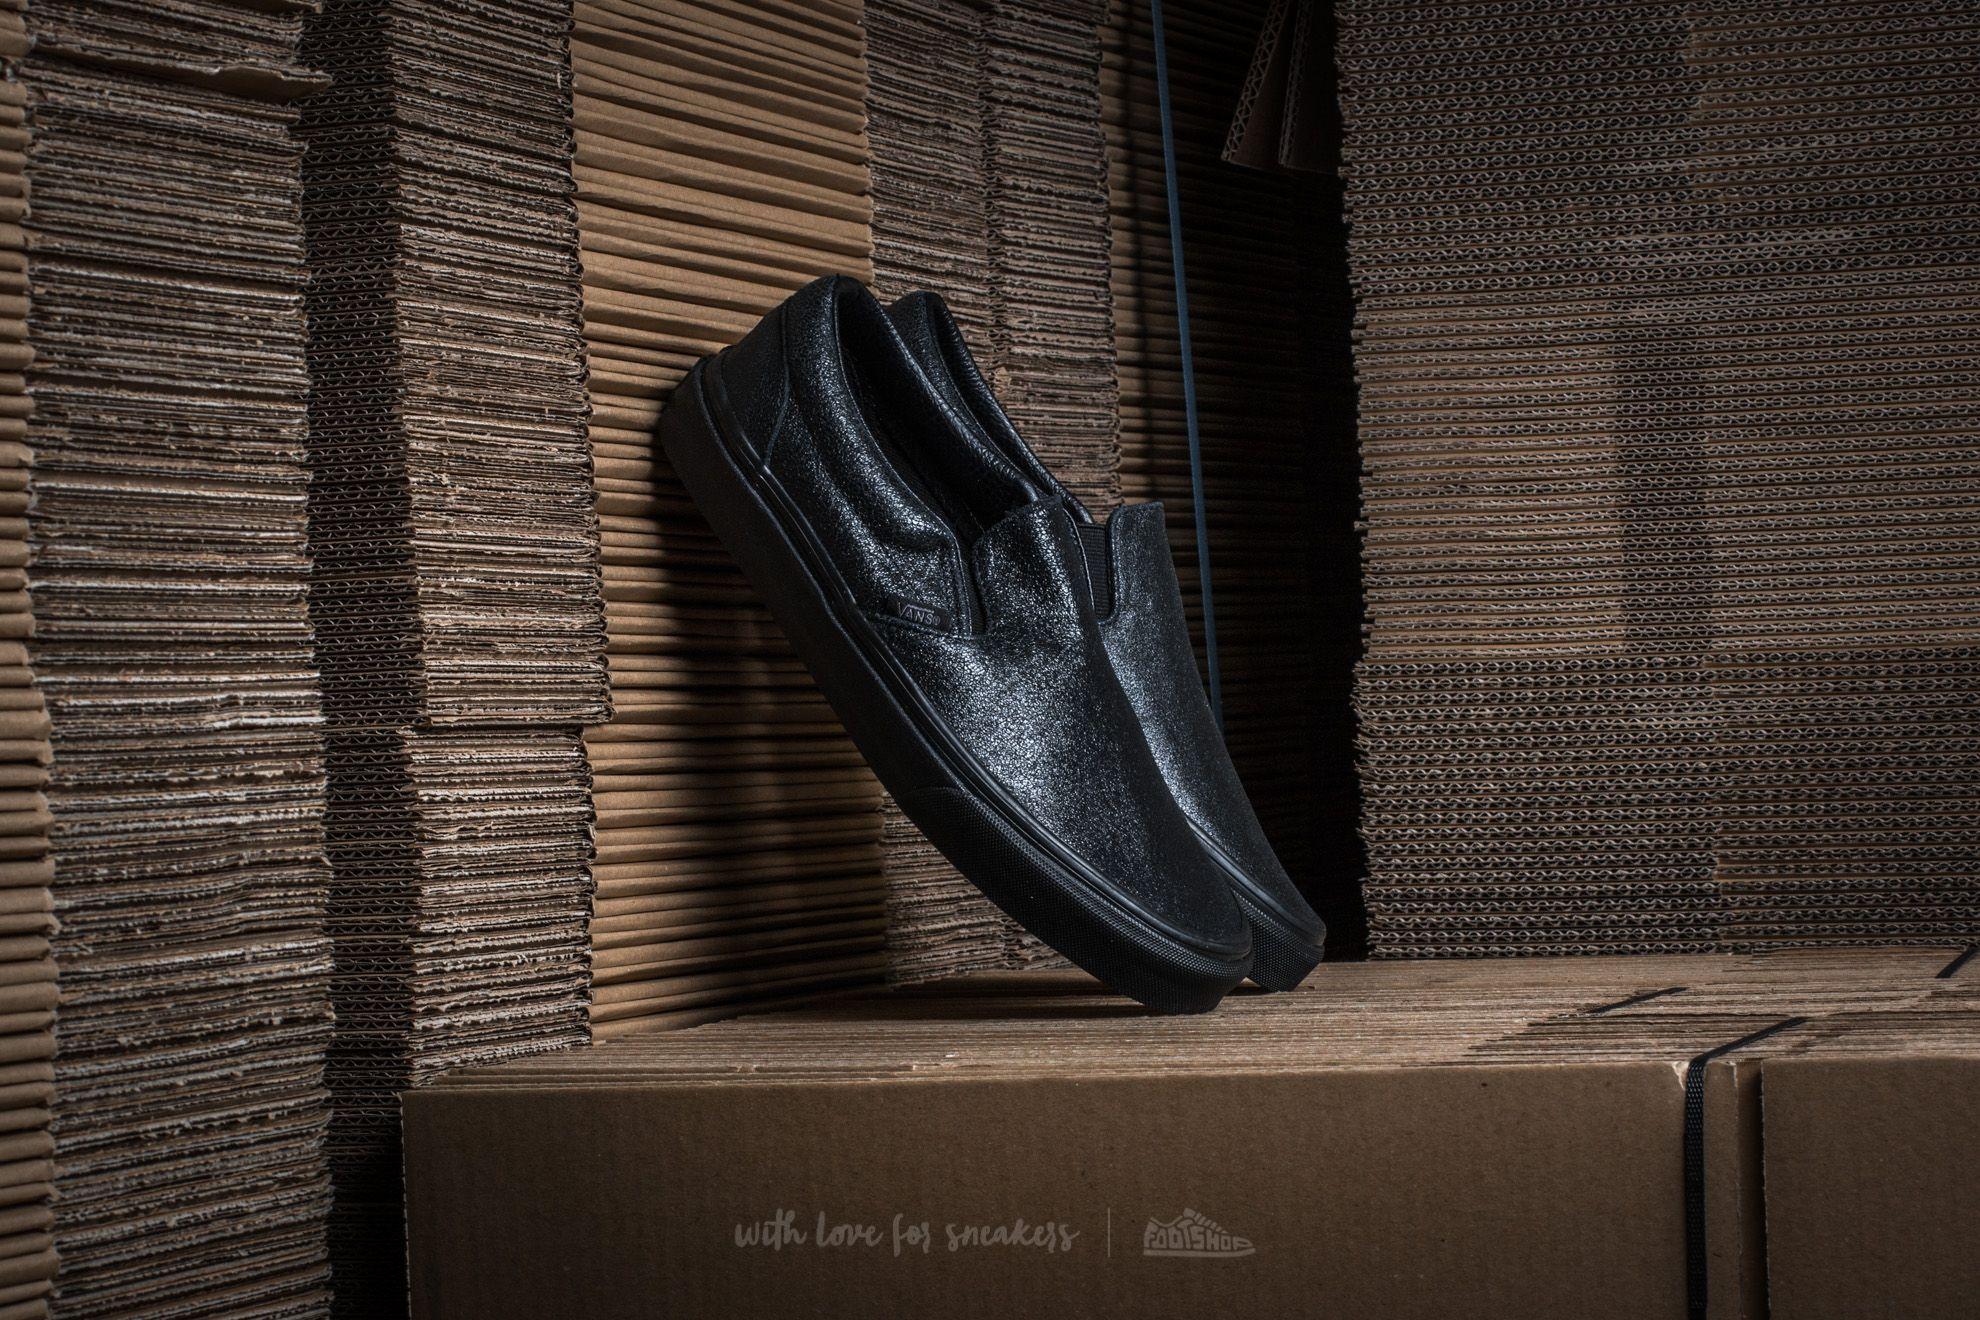 ede5235b82 Vans Classic Slip-On (Patent Crackle) Black  Black